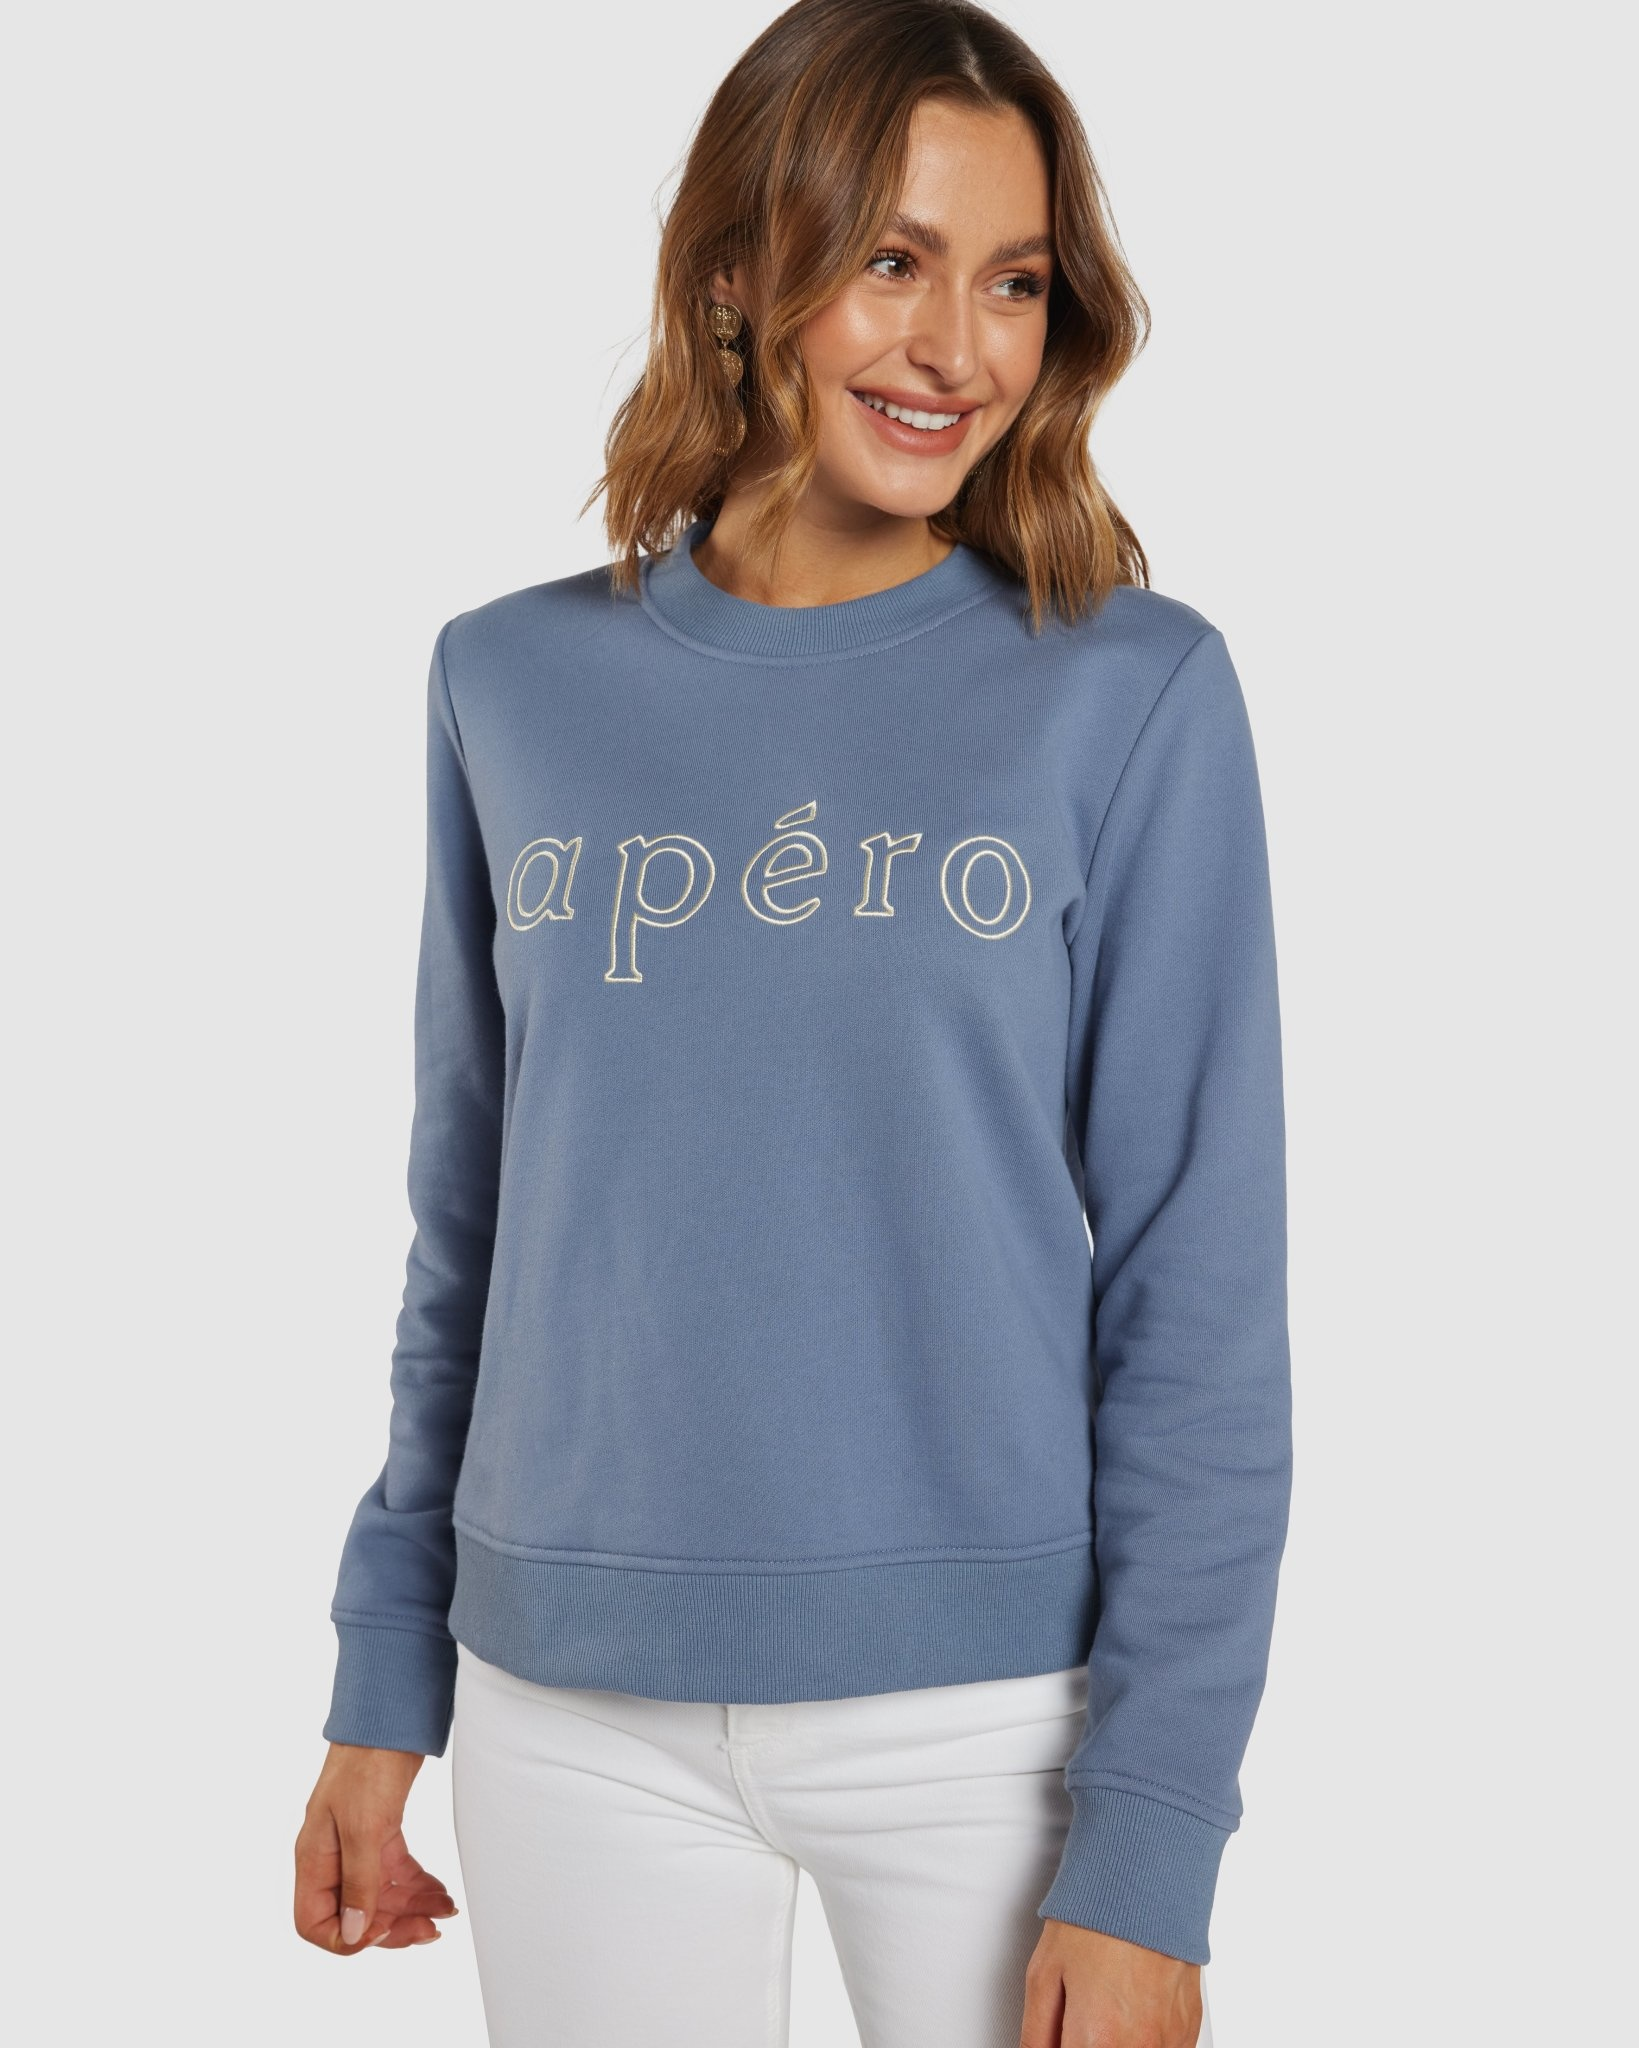 Apero Outline Emb Jumper Washed Blue/Cream